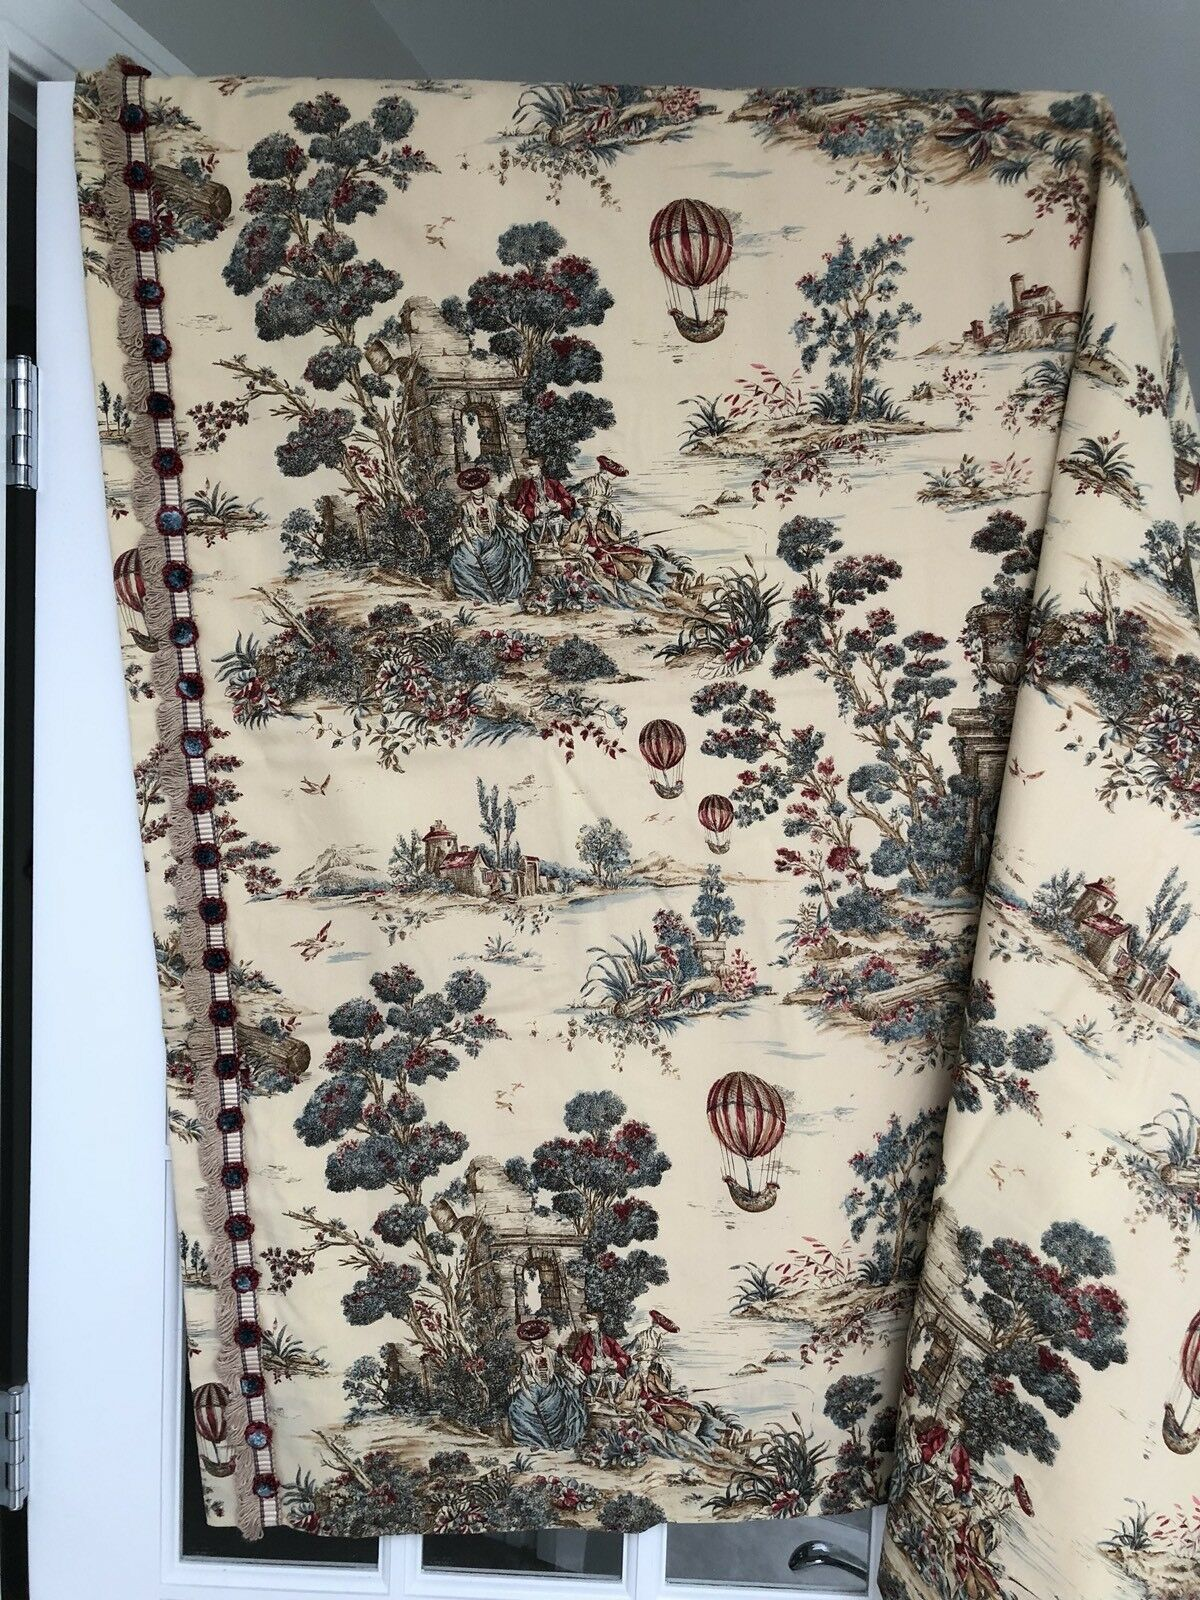 Cortina De Toile Cortinas A Medida 50  X 49  Almohadas Panel Forrado de decoración francesa amarre para